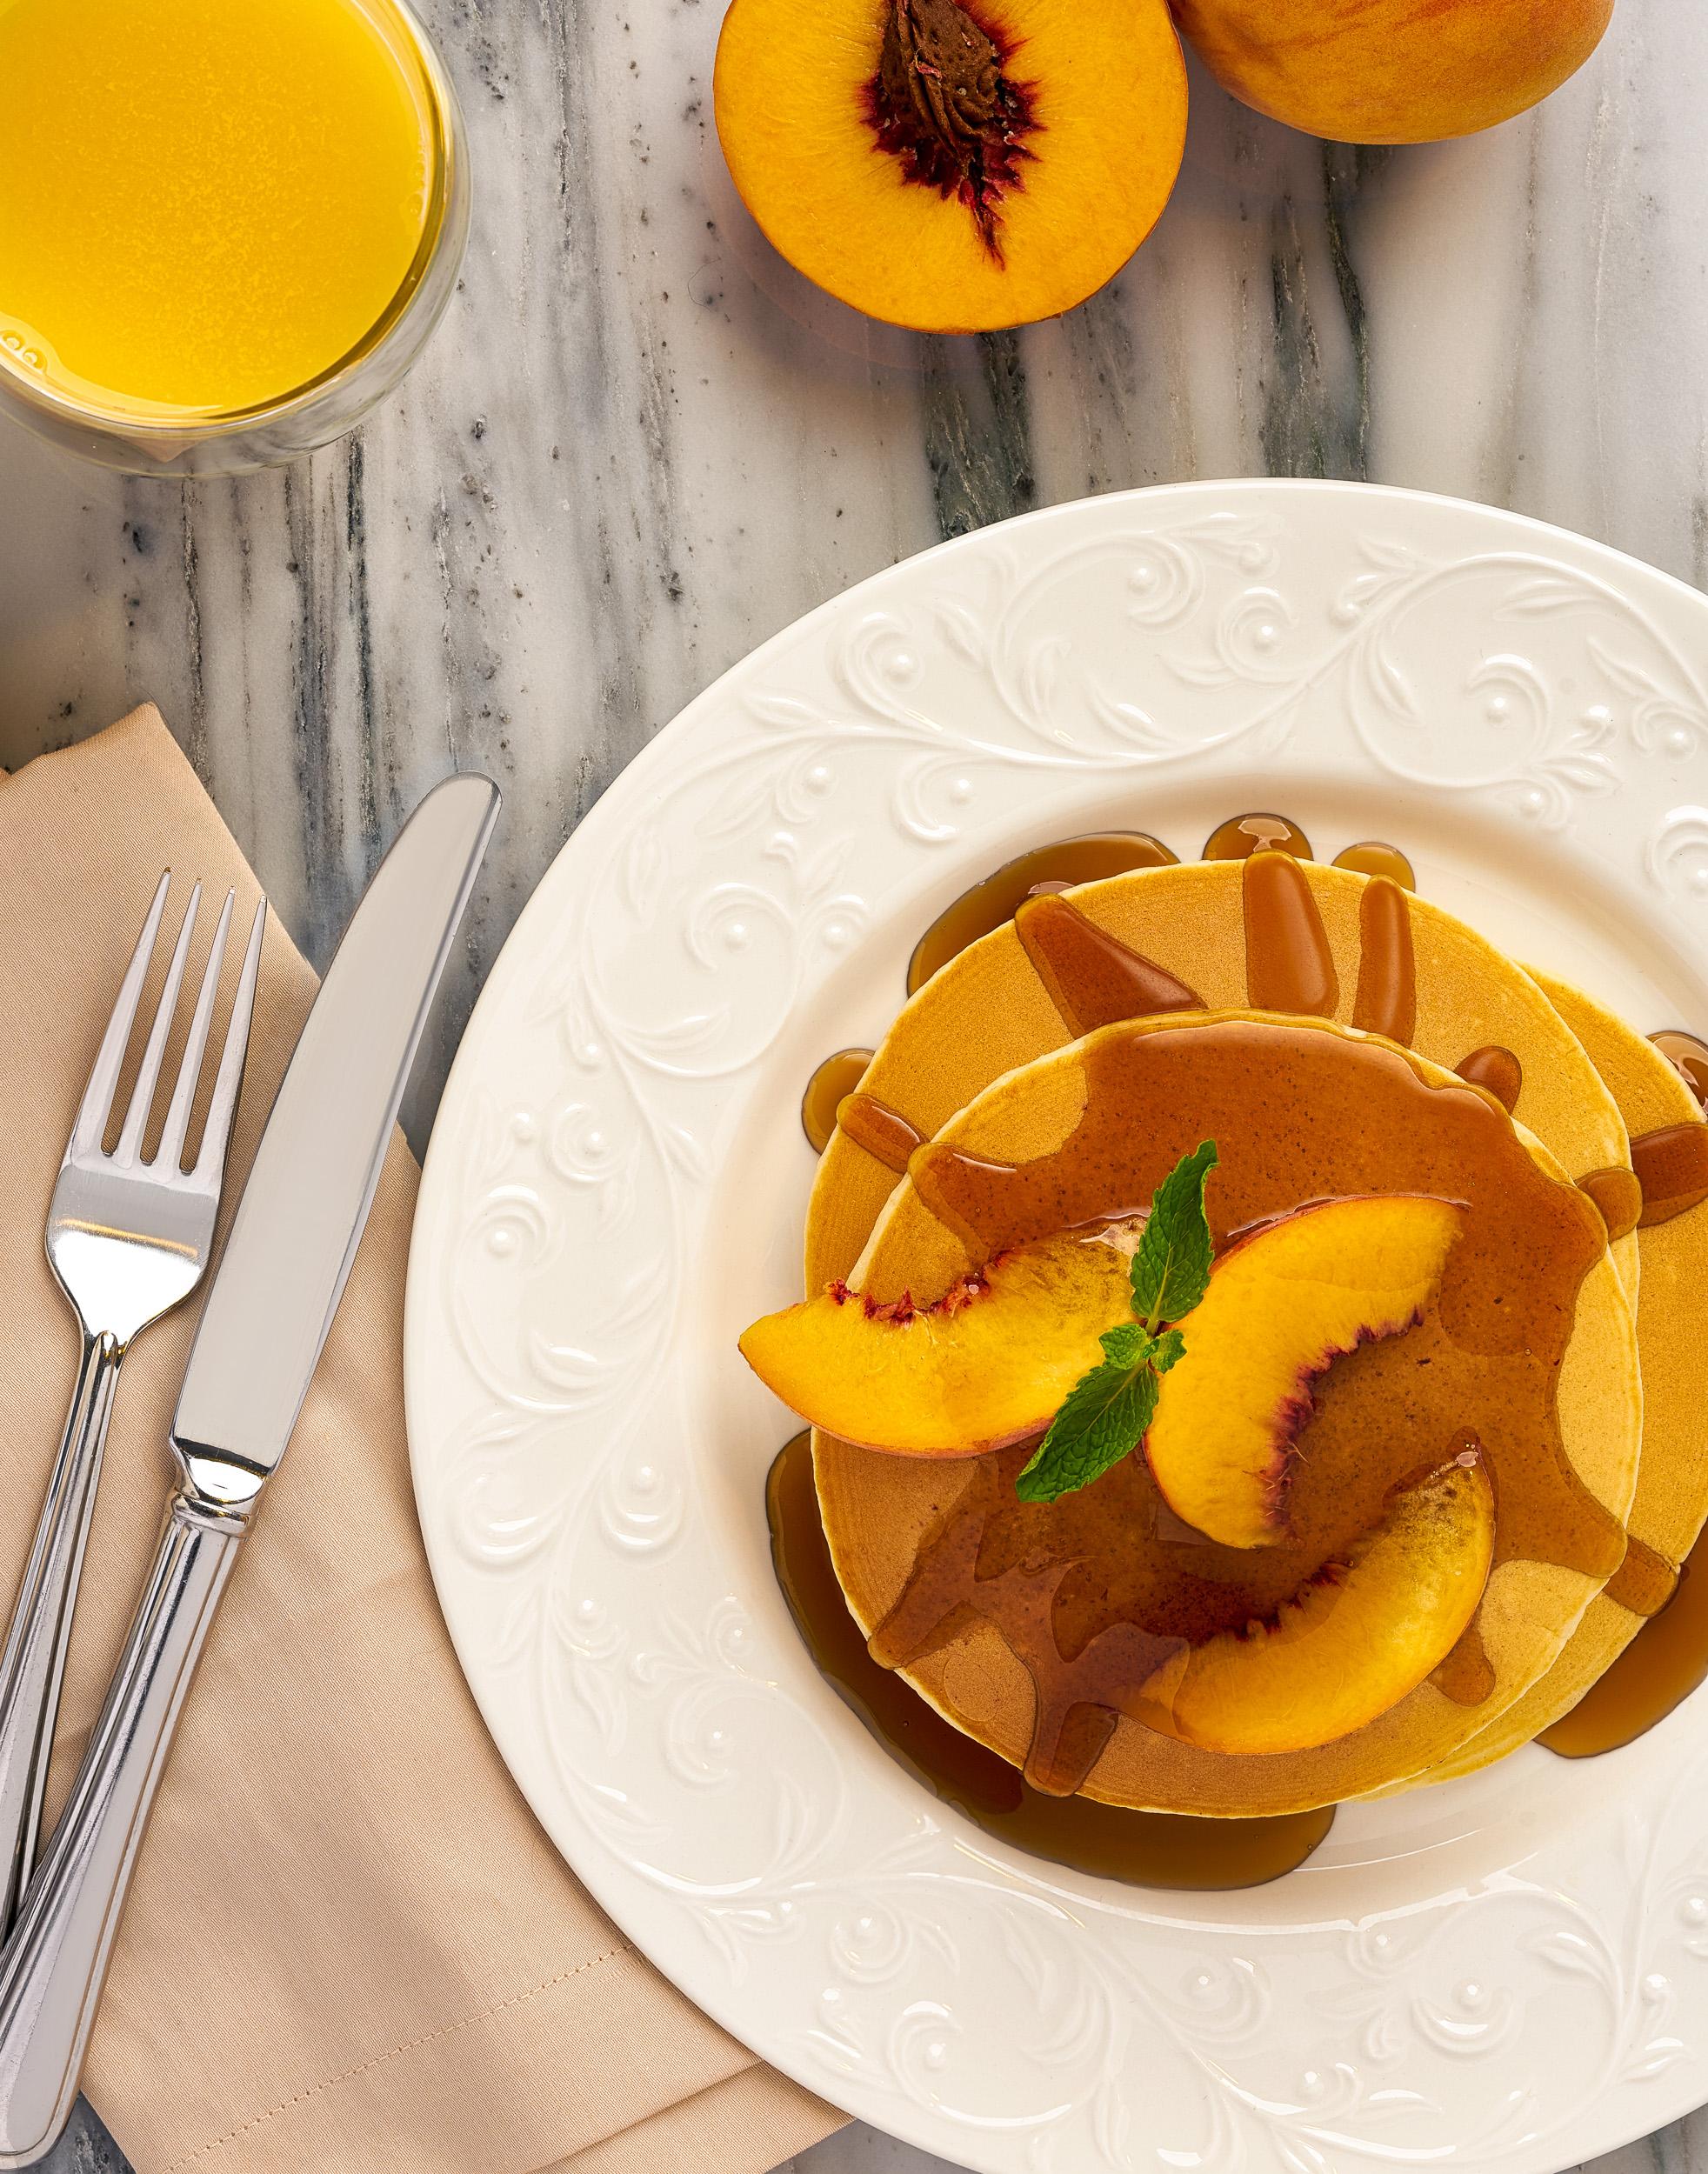 ApricotPancakesl_Miami_food_photographer_Franklin_Castillo-Edit-Edit-Edit-Edit-Edit.jpg